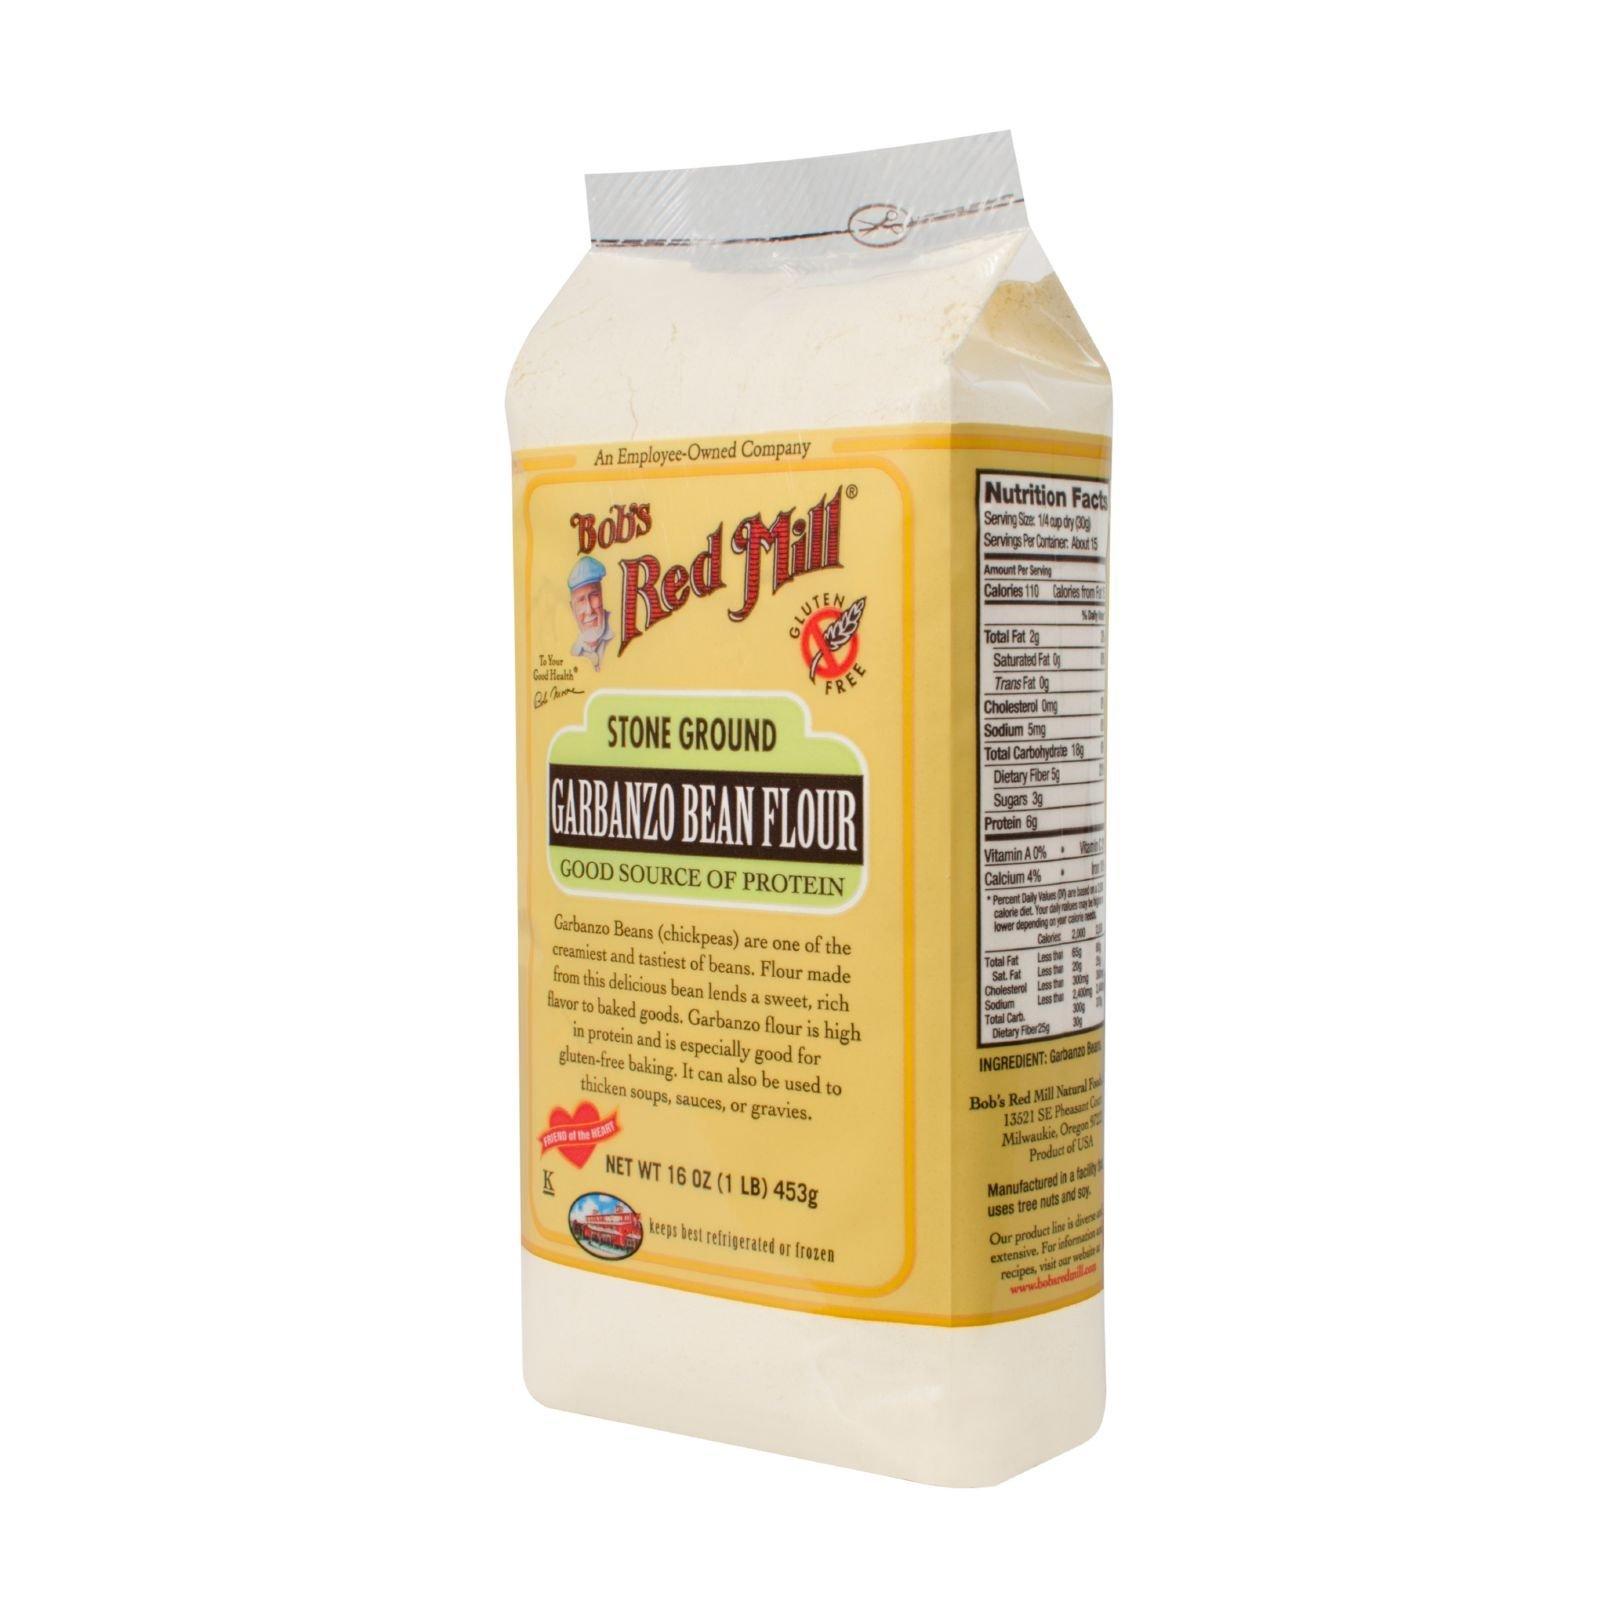 Bobs Red Mill Garbanzo Bean Flour - 16 oz - Case of 4 - Gluten Free -